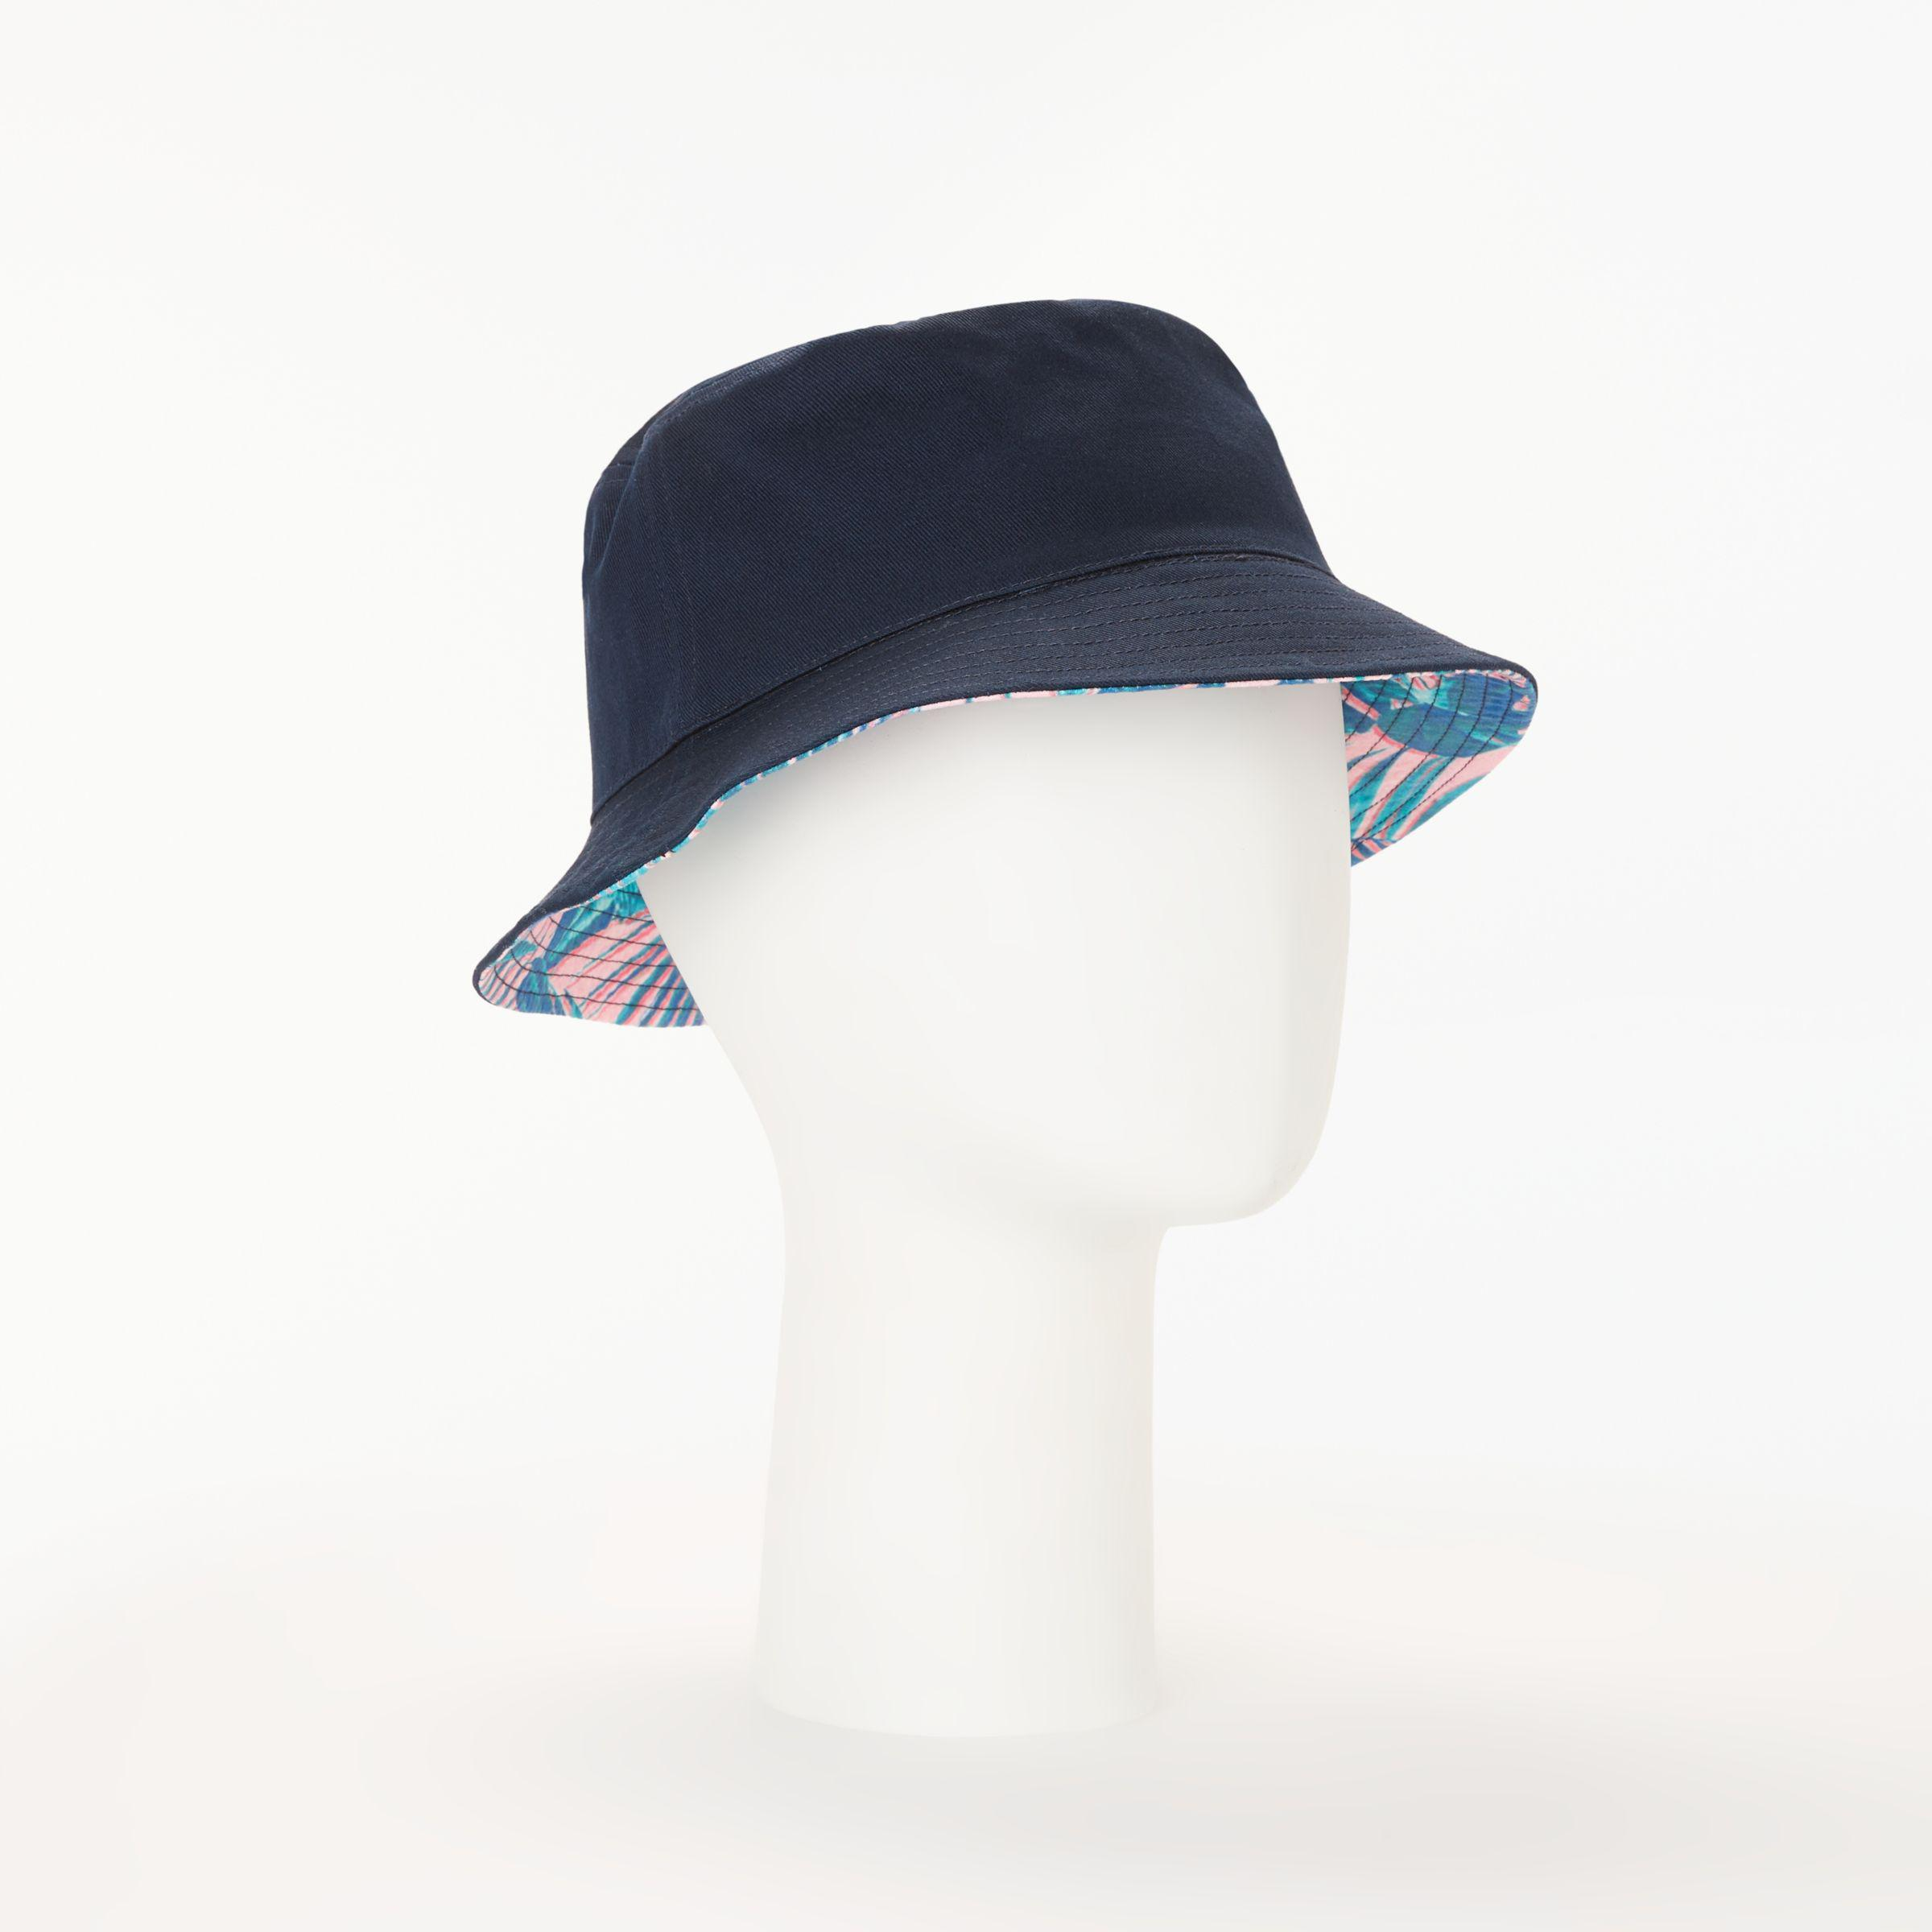 c7d6d654998 Lyst - John Lewis Reversible Bucket Hat in Blue